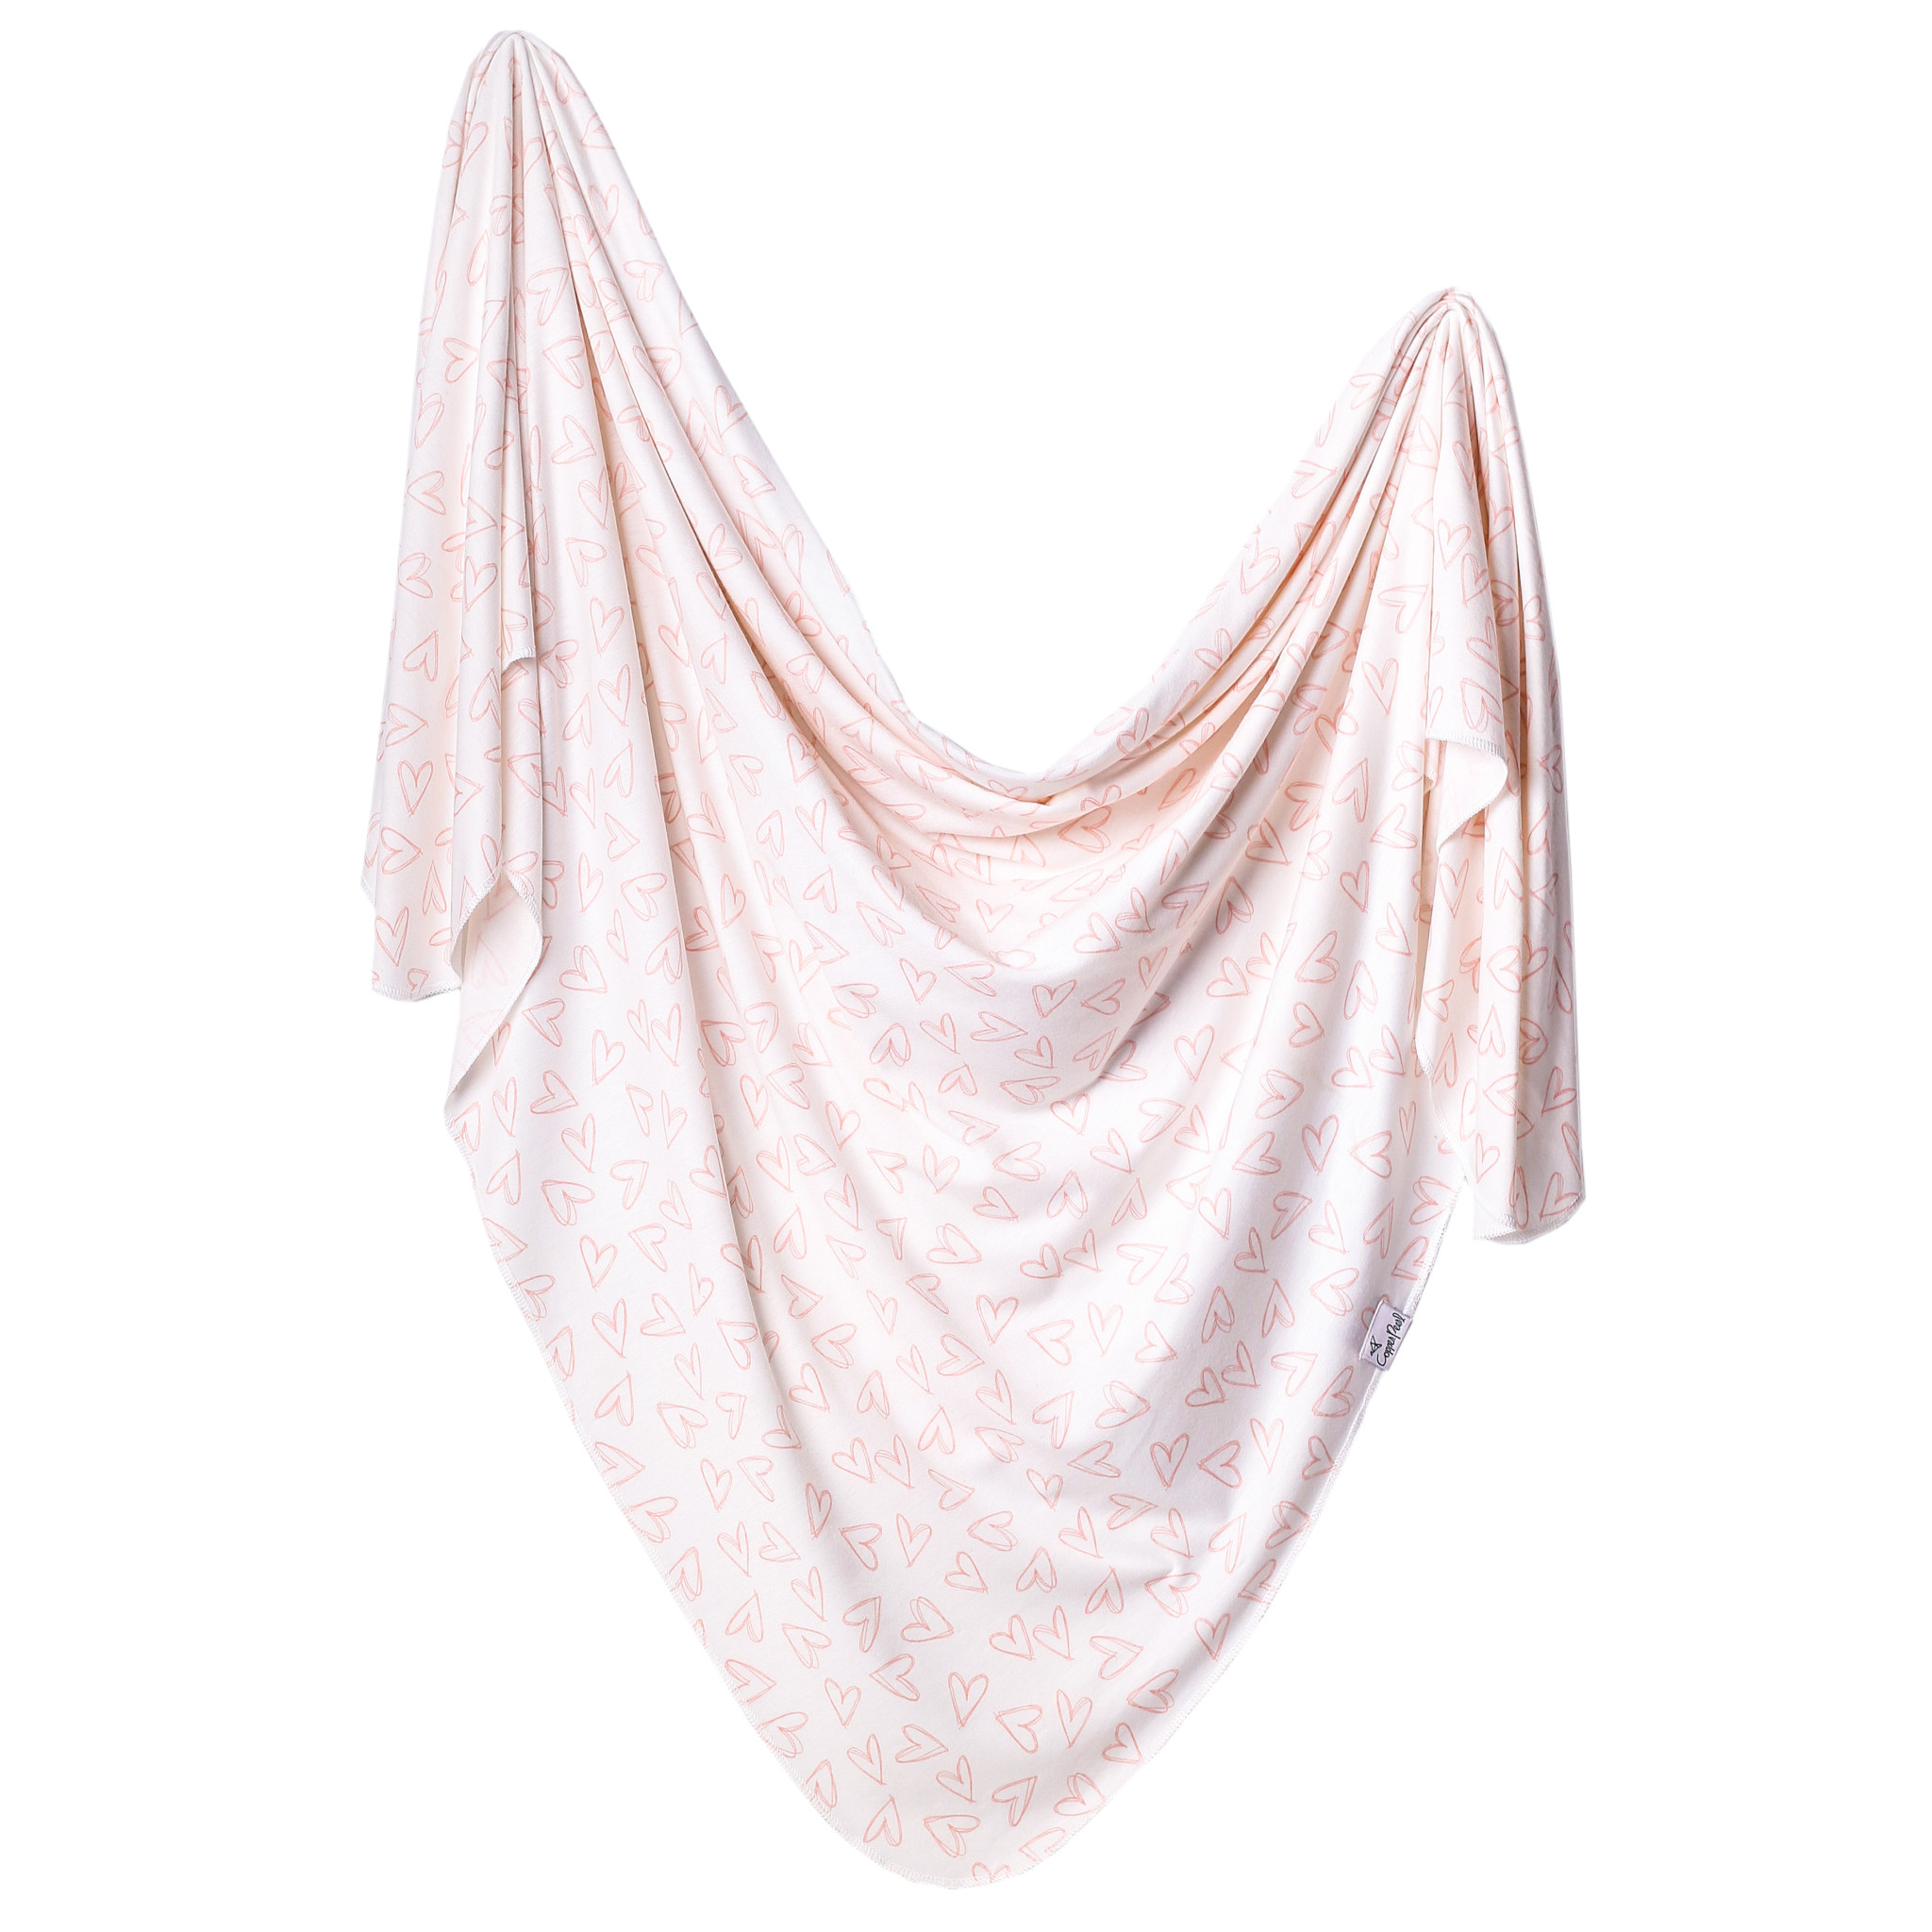 Copper Pearl Knit Swaddle Blanket Lola